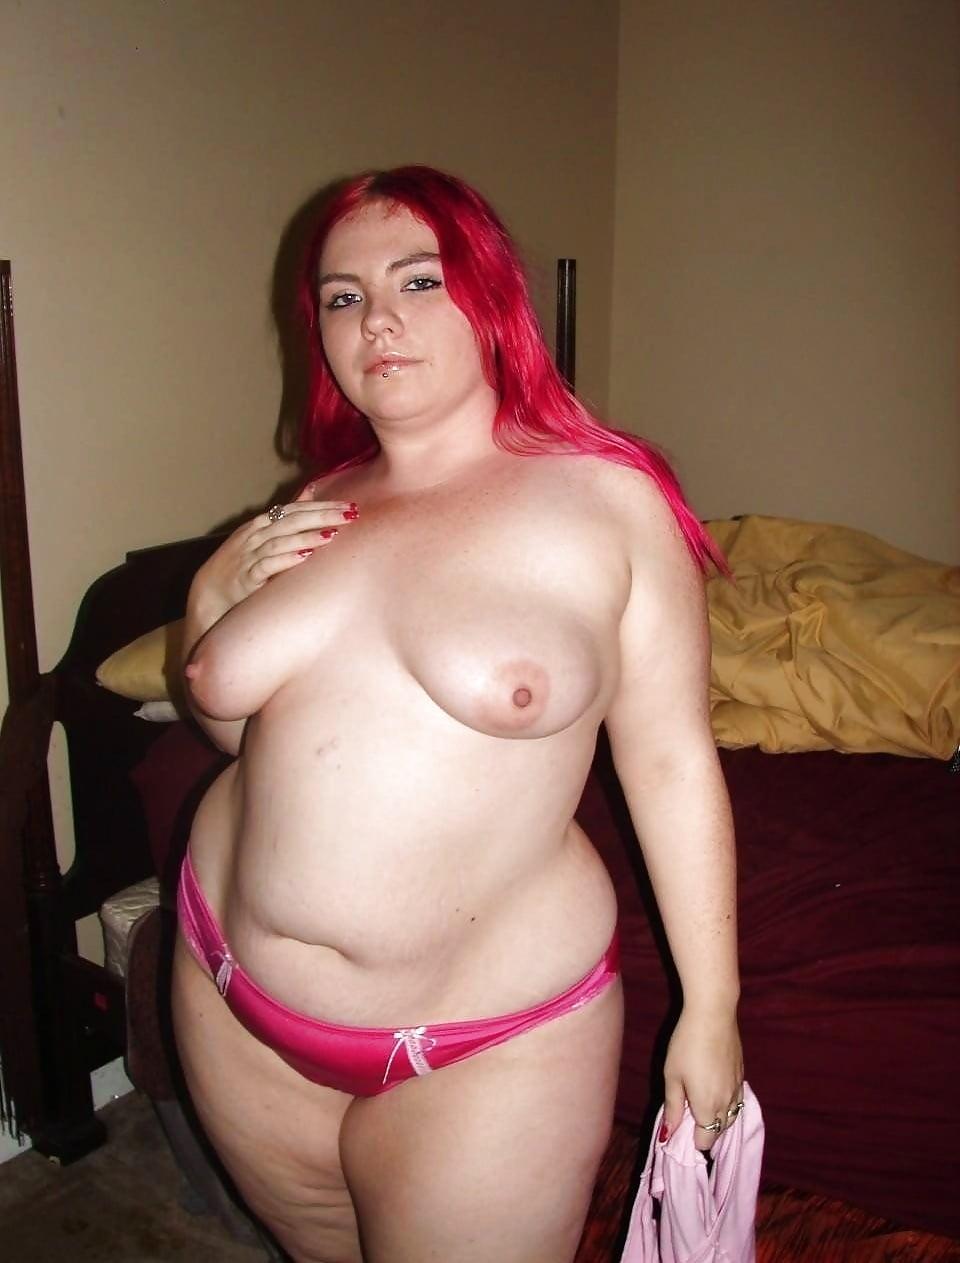 Chubby hotties xhamster, girls craving cum